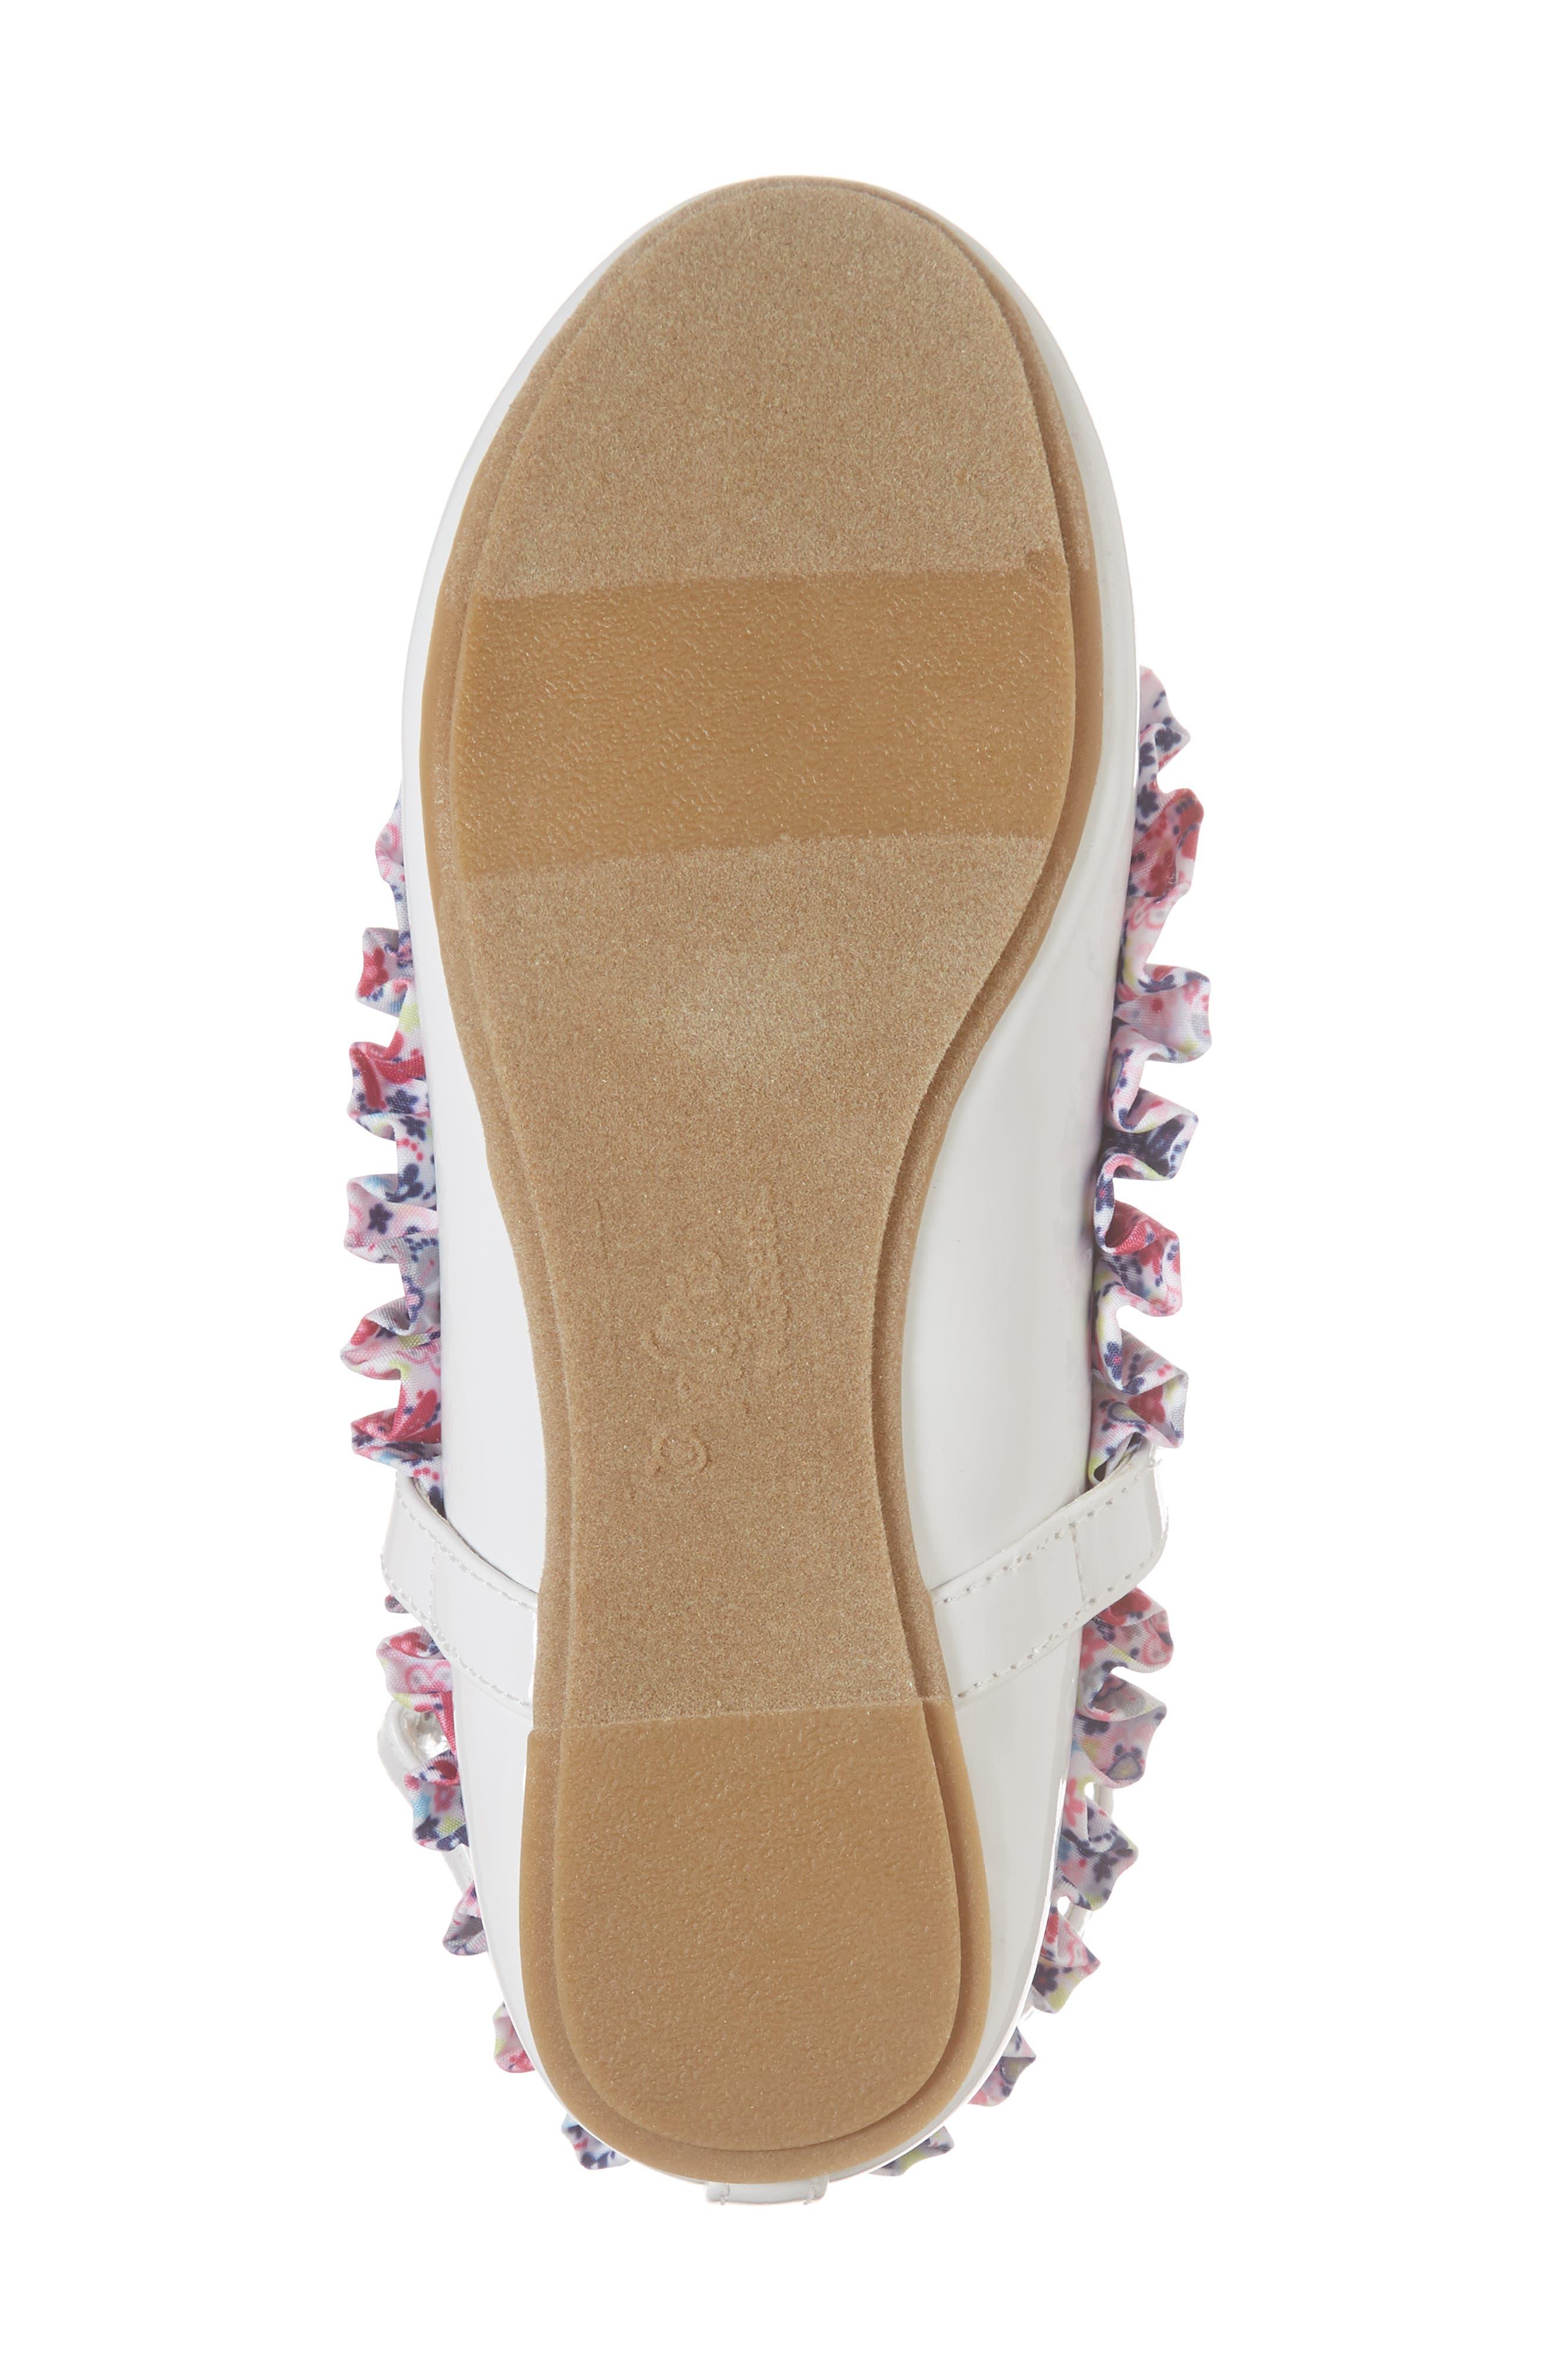 Kendall Ruffle Ballet Flat,                             Alternate thumbnail 6, color,                             White